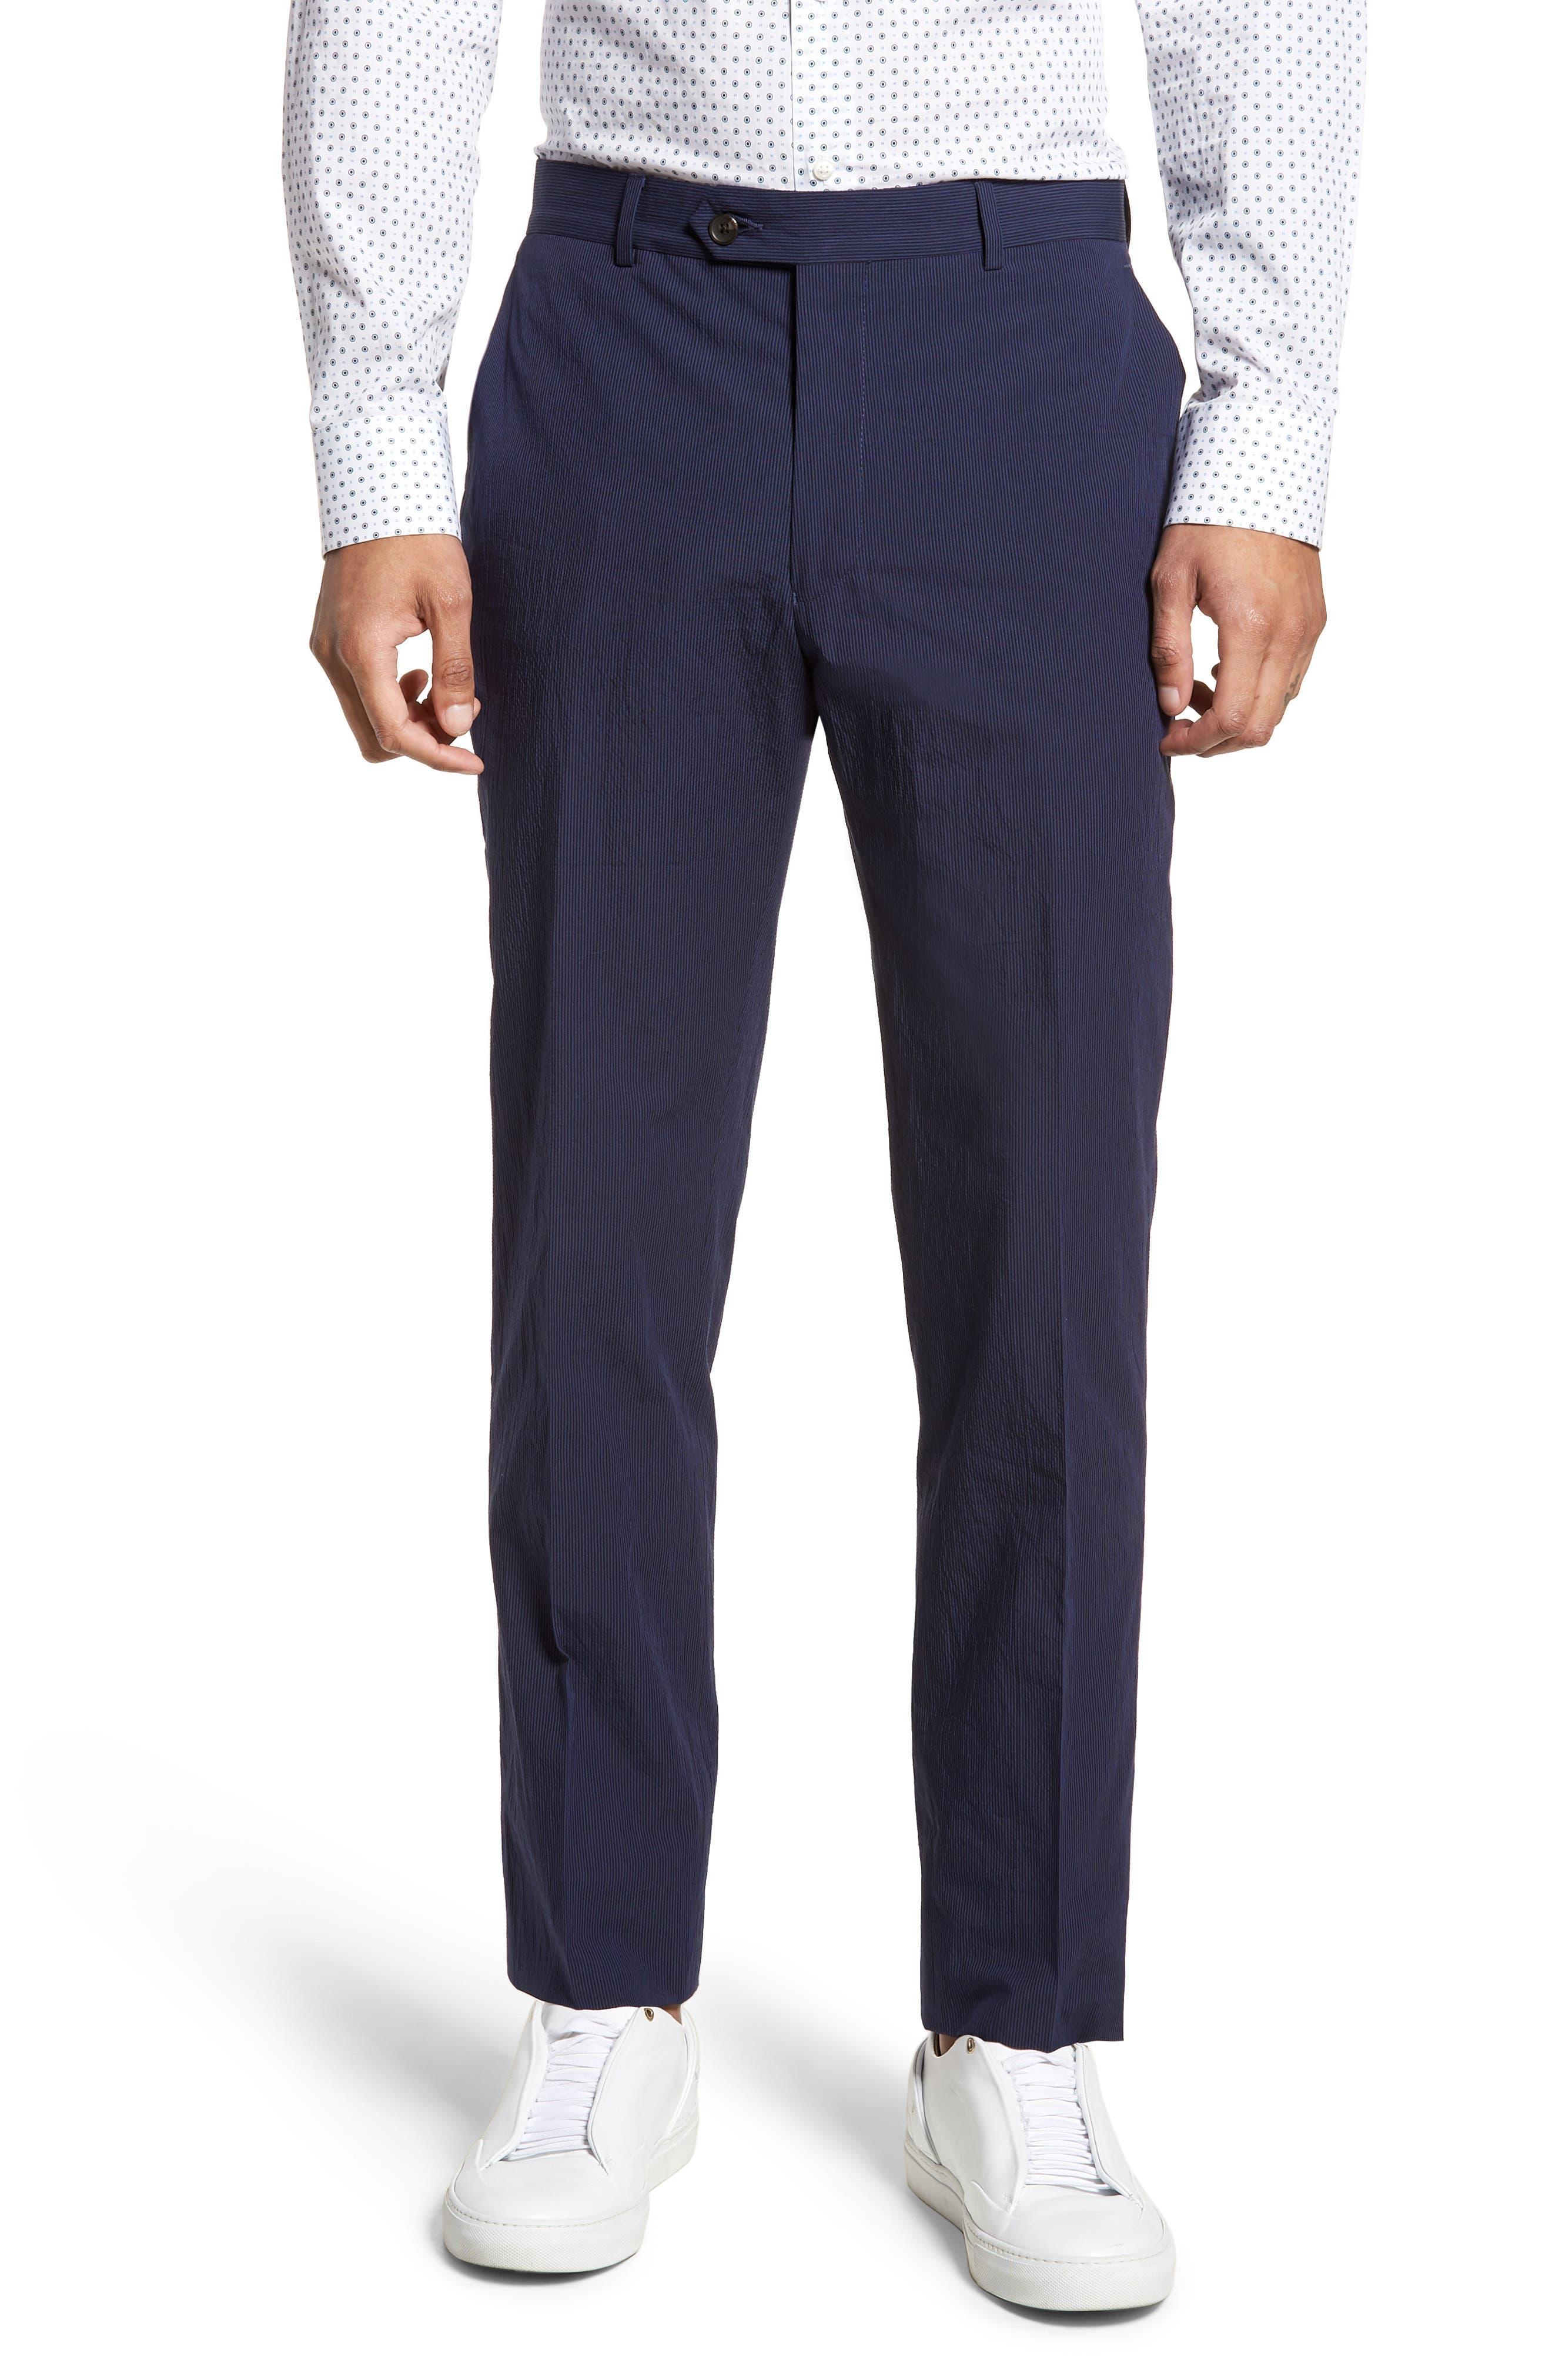 Strong Suit Dagger Flat Front Seersucker Trousers